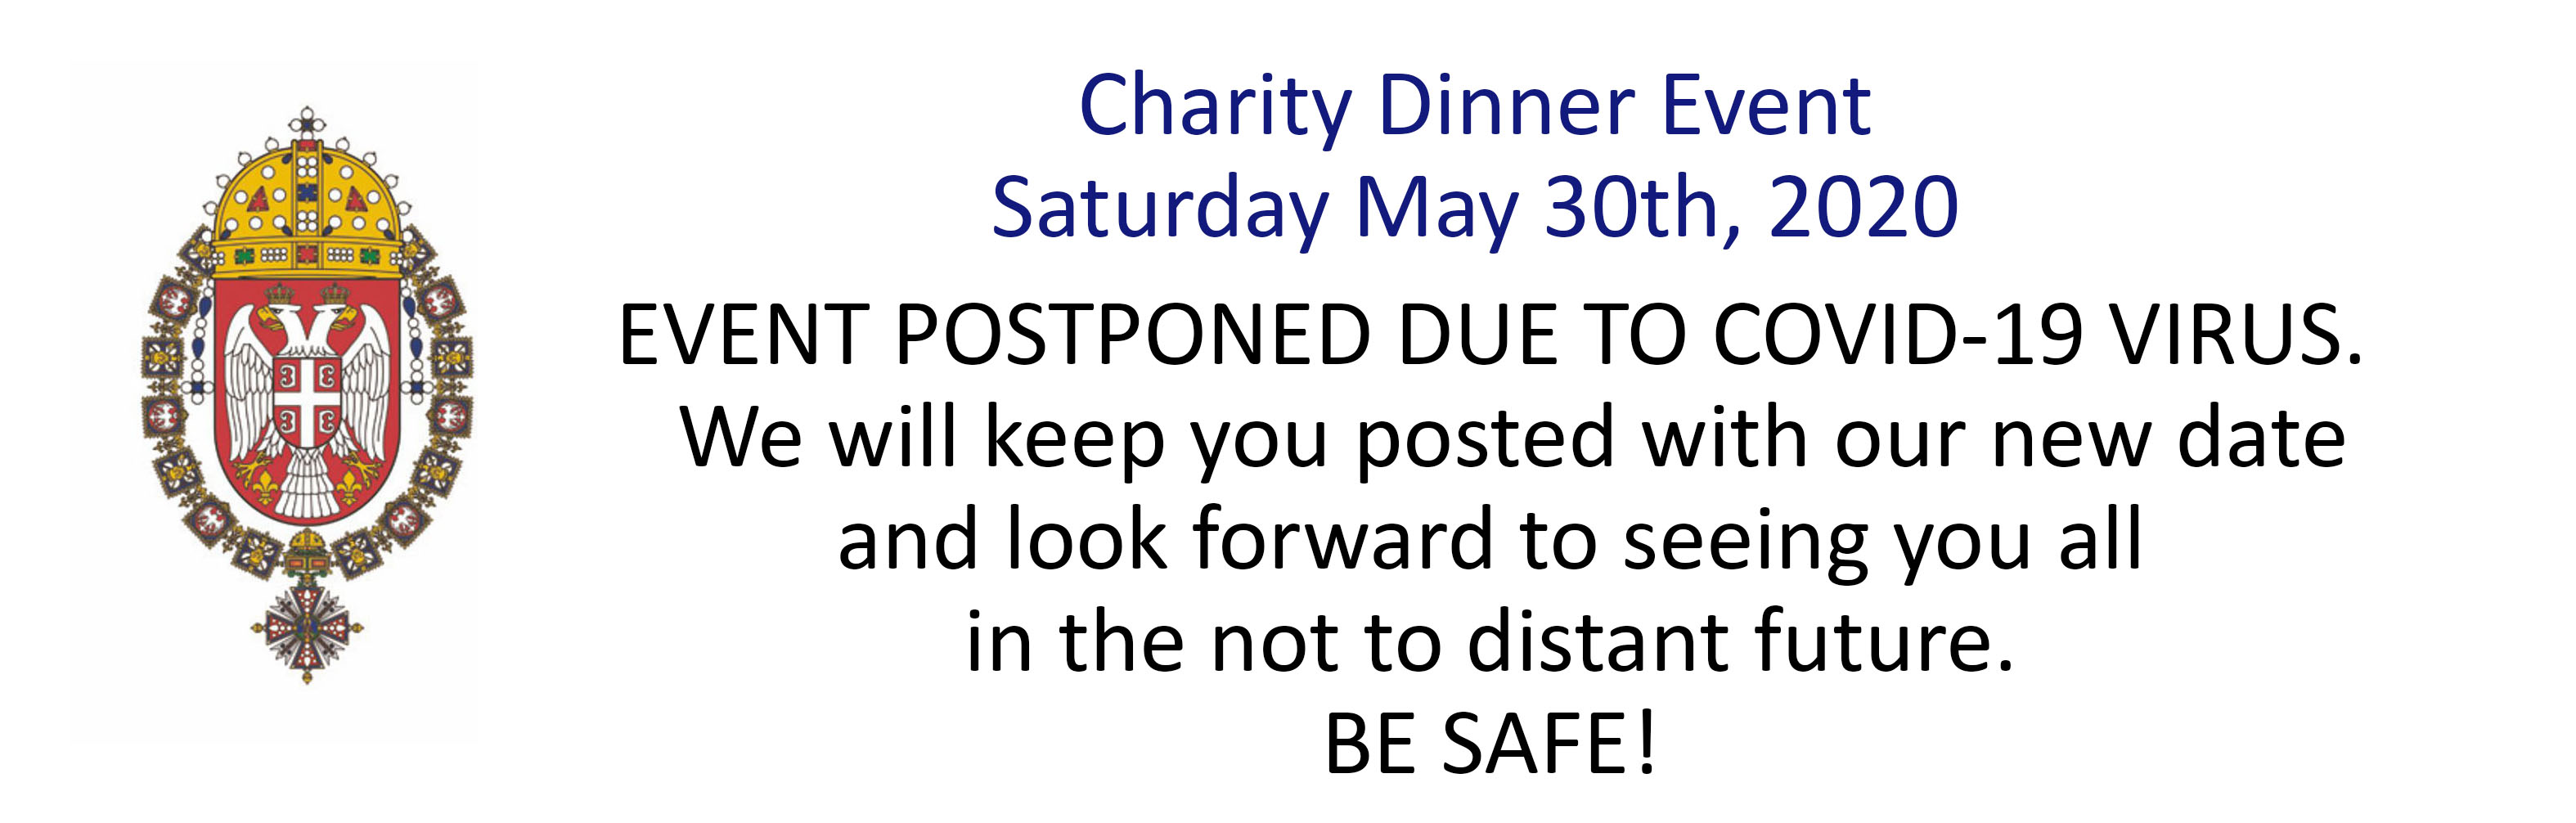 Charitypostponed.